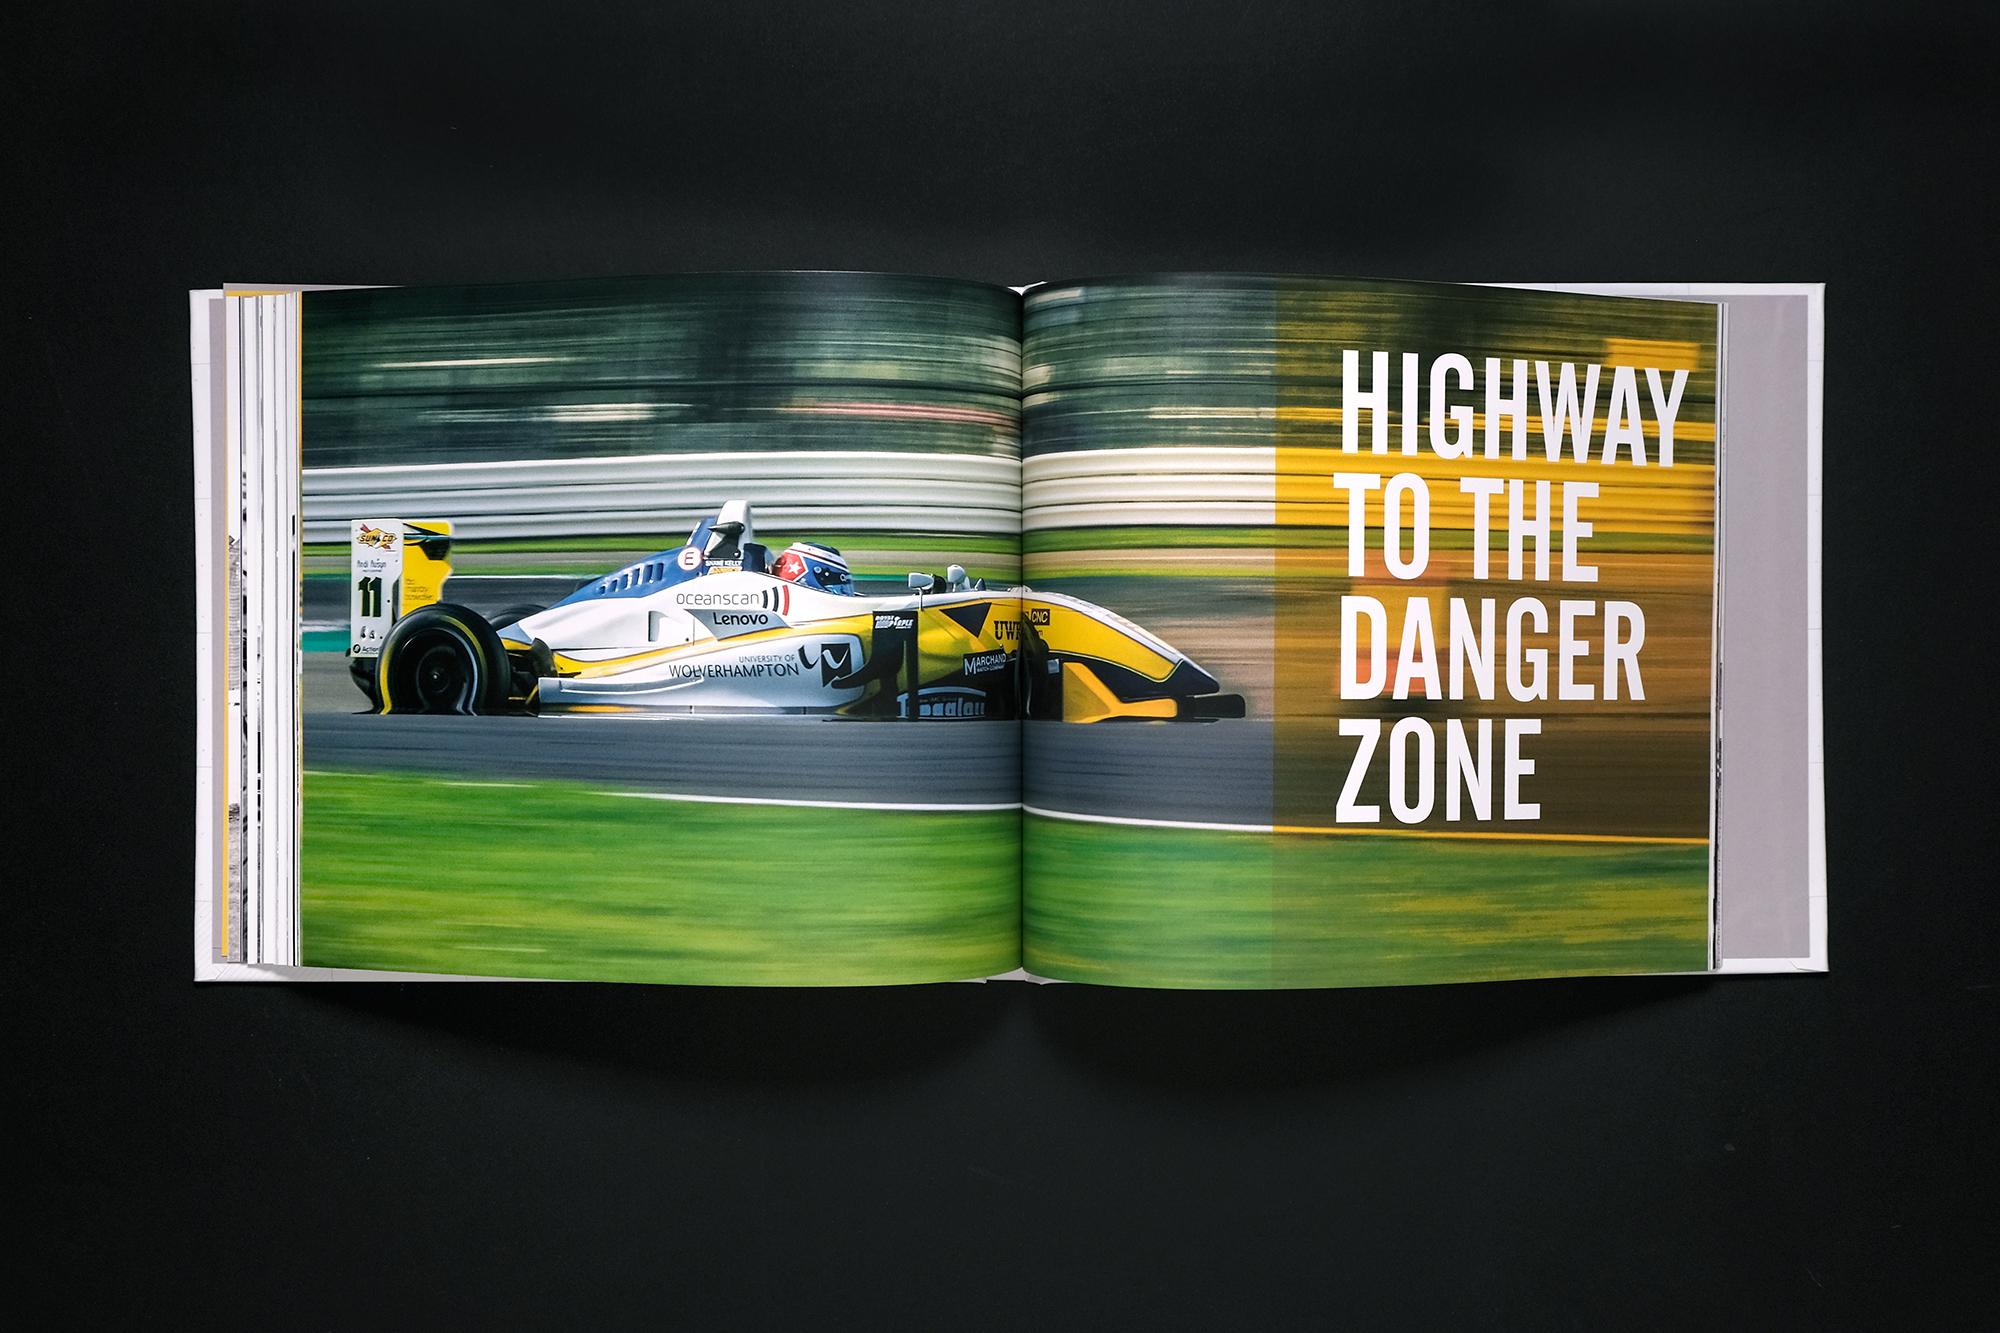 http://rusyndesign.co.uk/wp-content/uploads/2020/04/UWR-19-book-shots-19.jpg